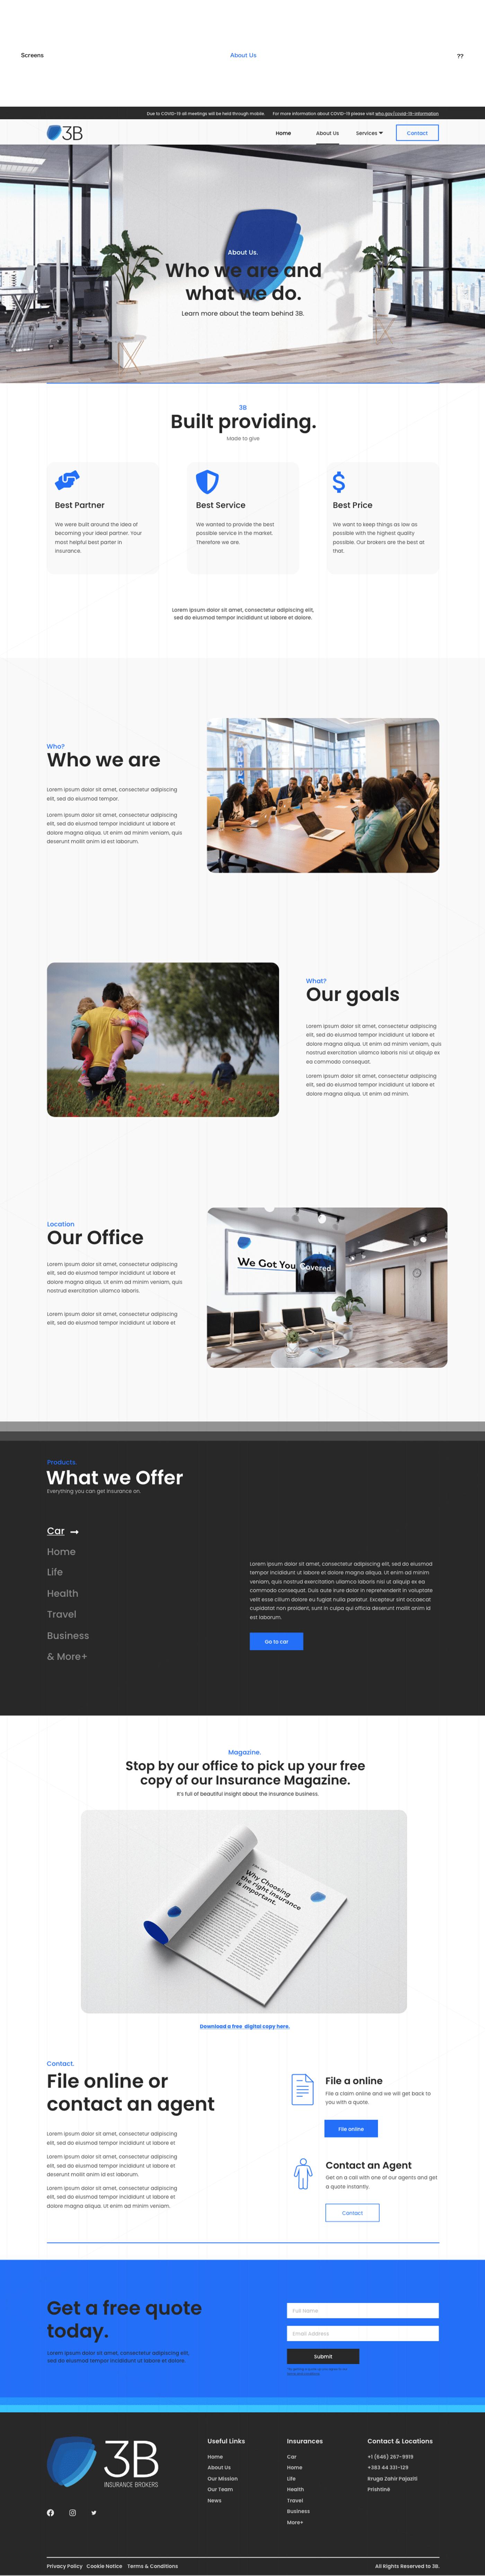 Adobe XD design User Experience Design user interface Web Design  web development  Website